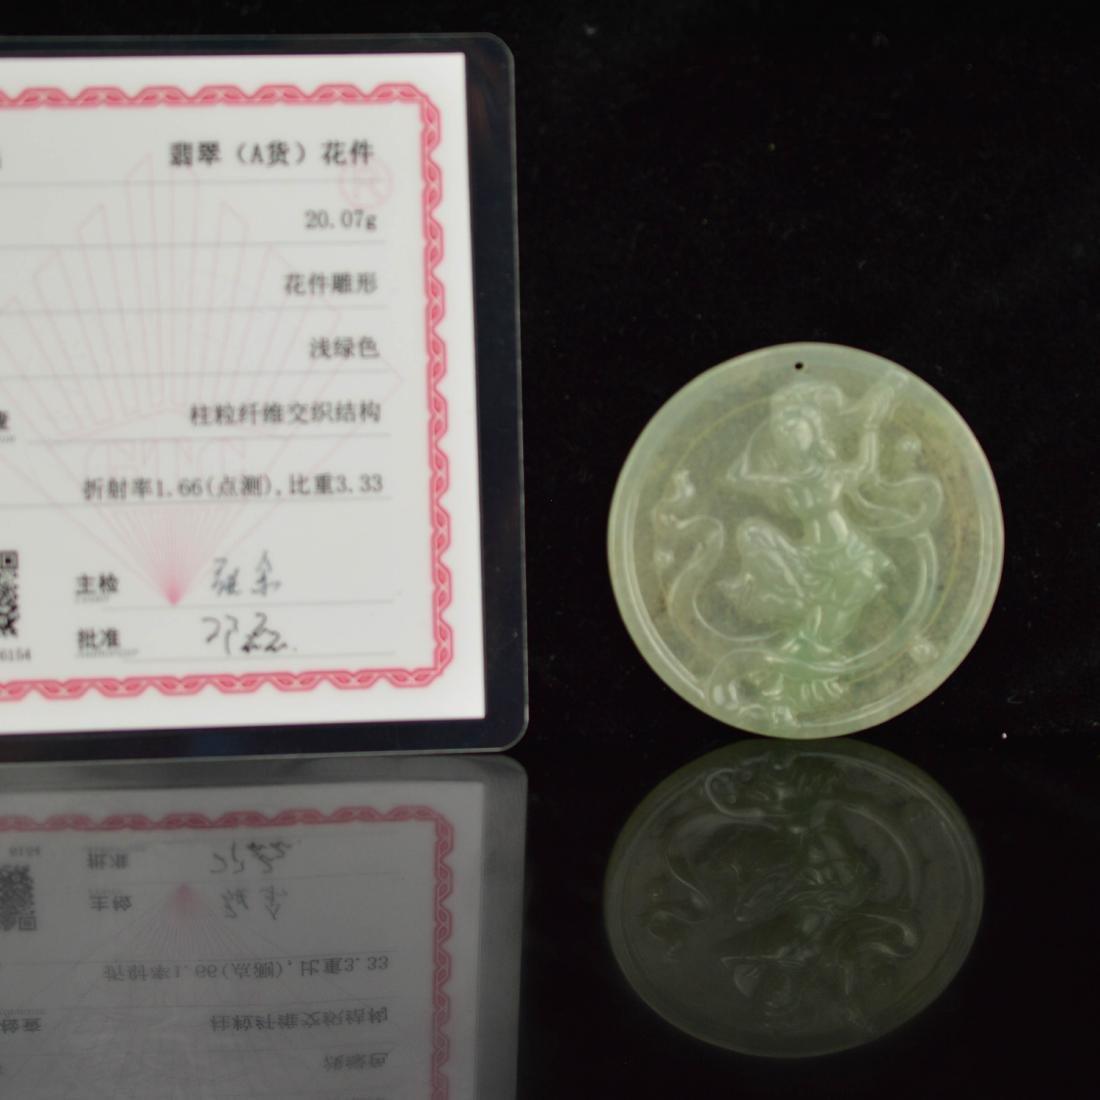 Certified Icy jadeite pendant